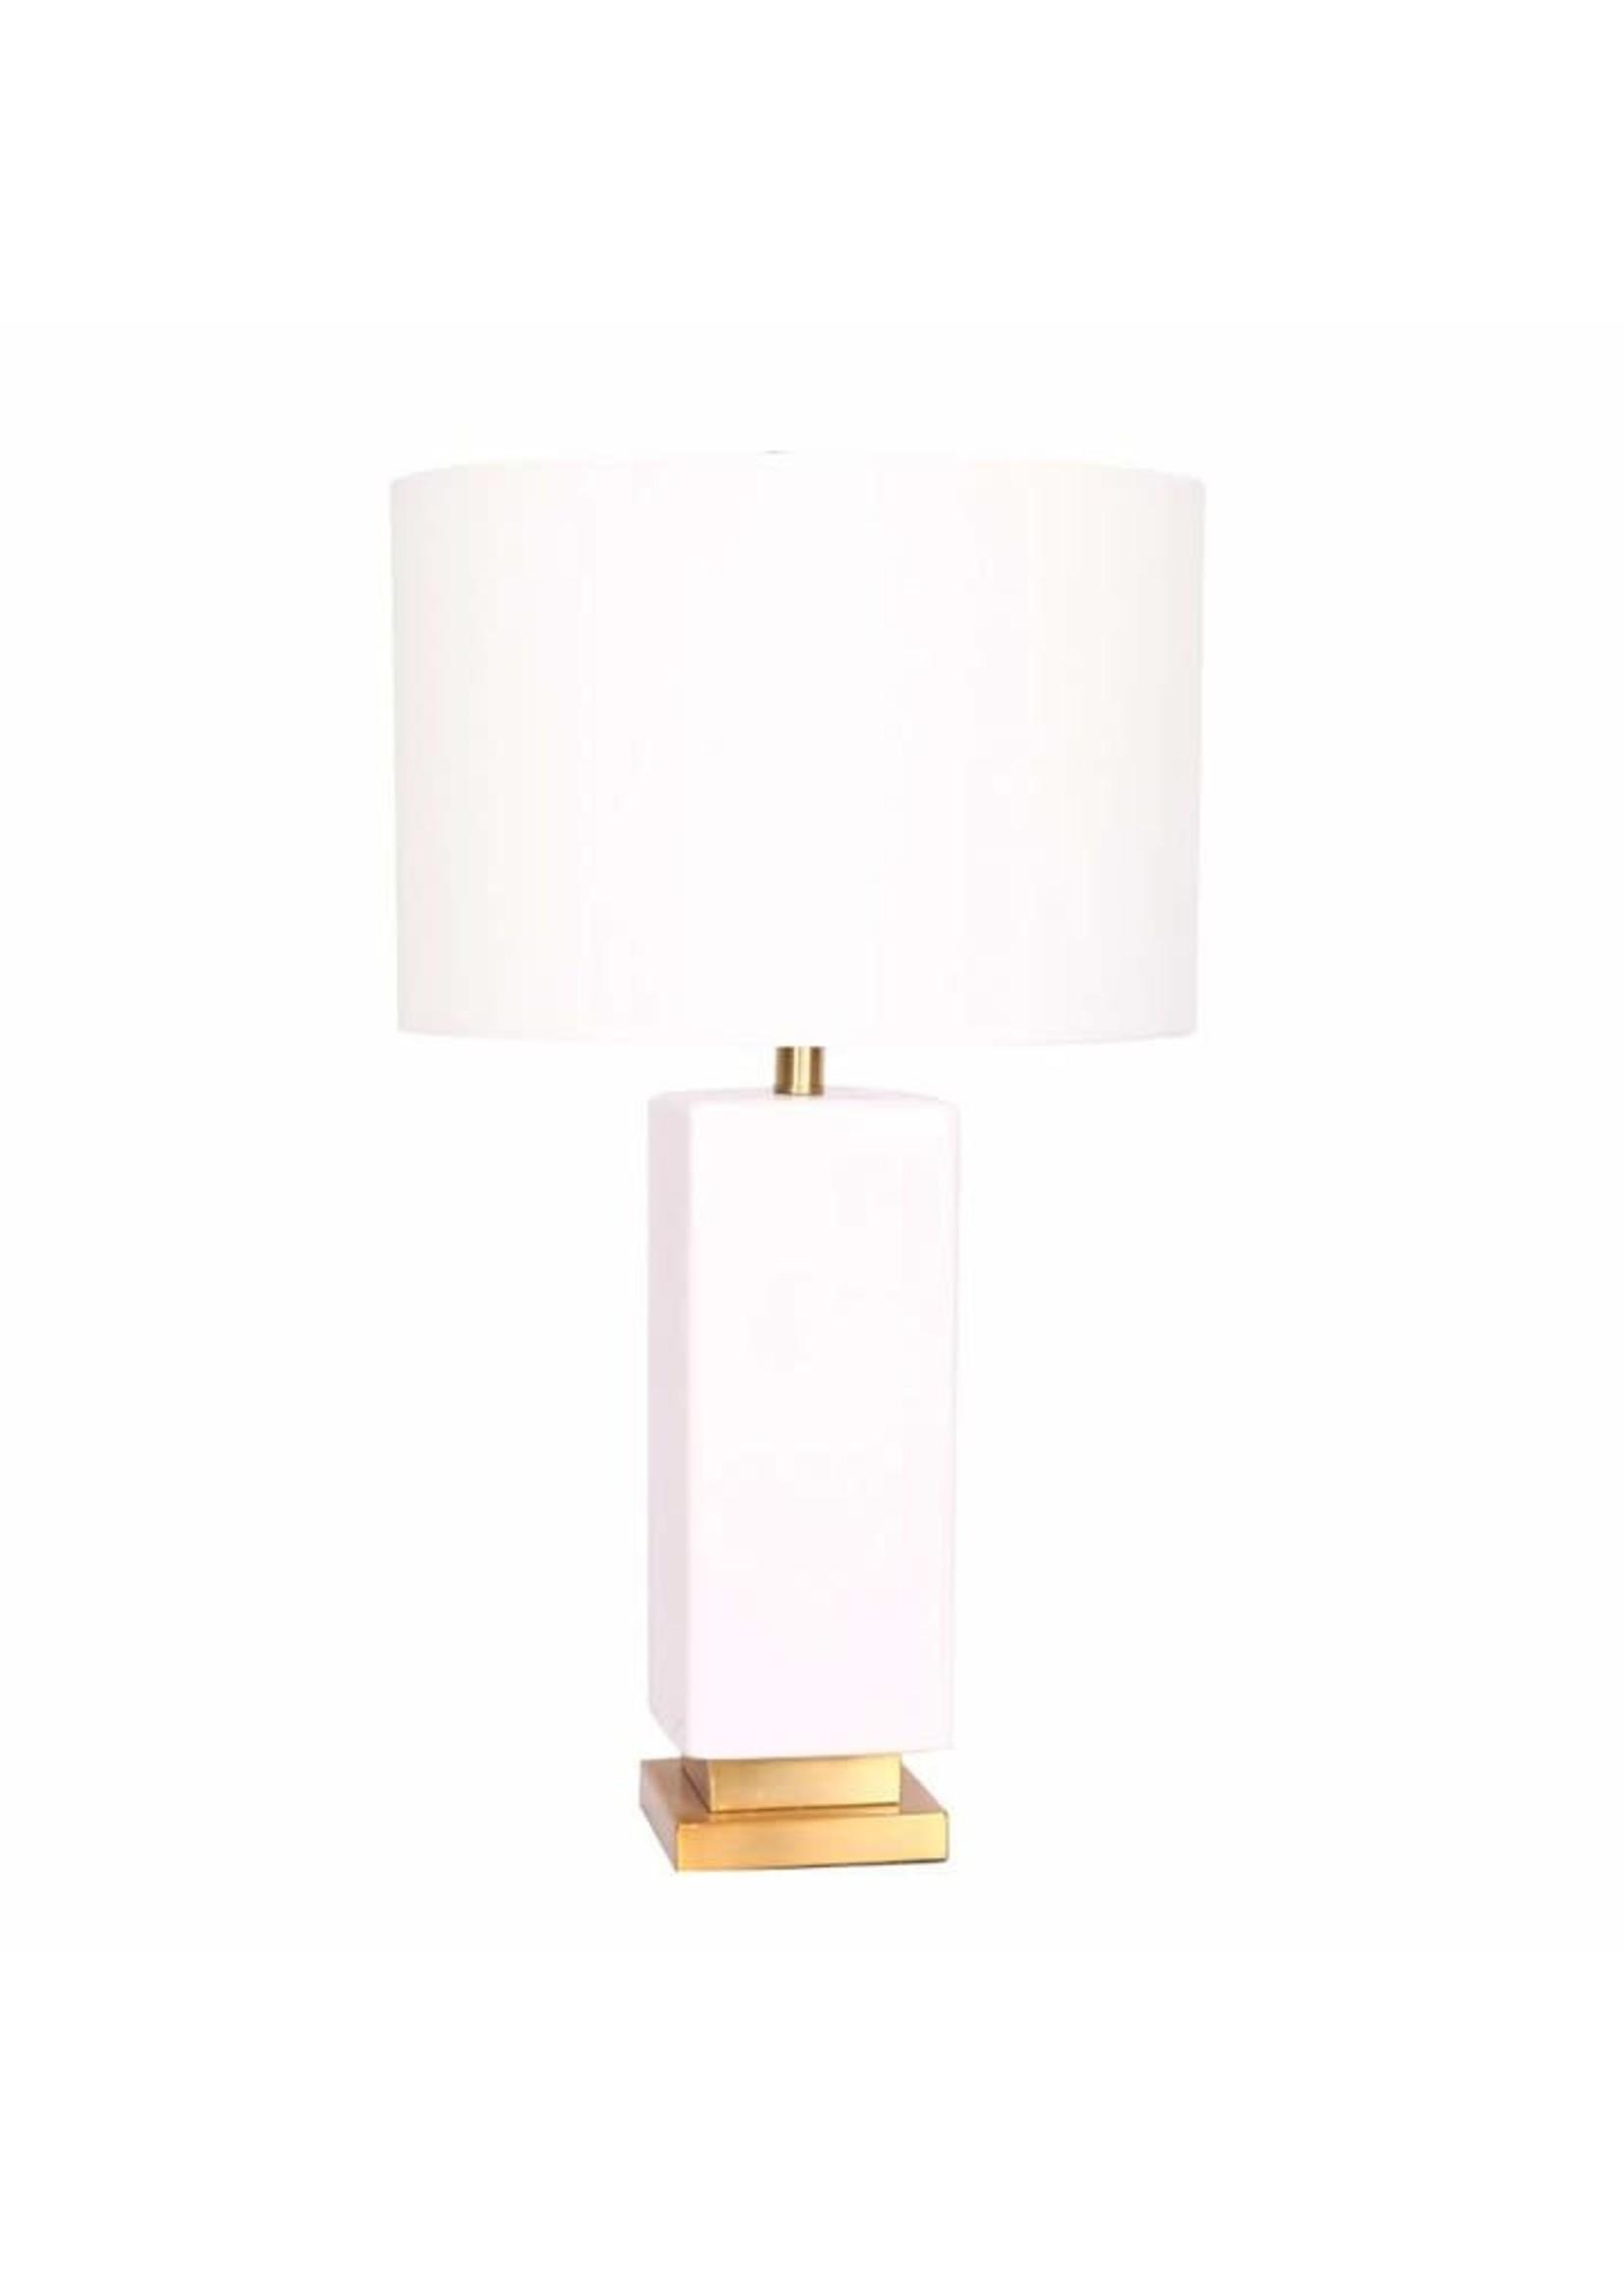 "Sagebrook Home SBH 27"" Ceramic Table Lamp White Gold"